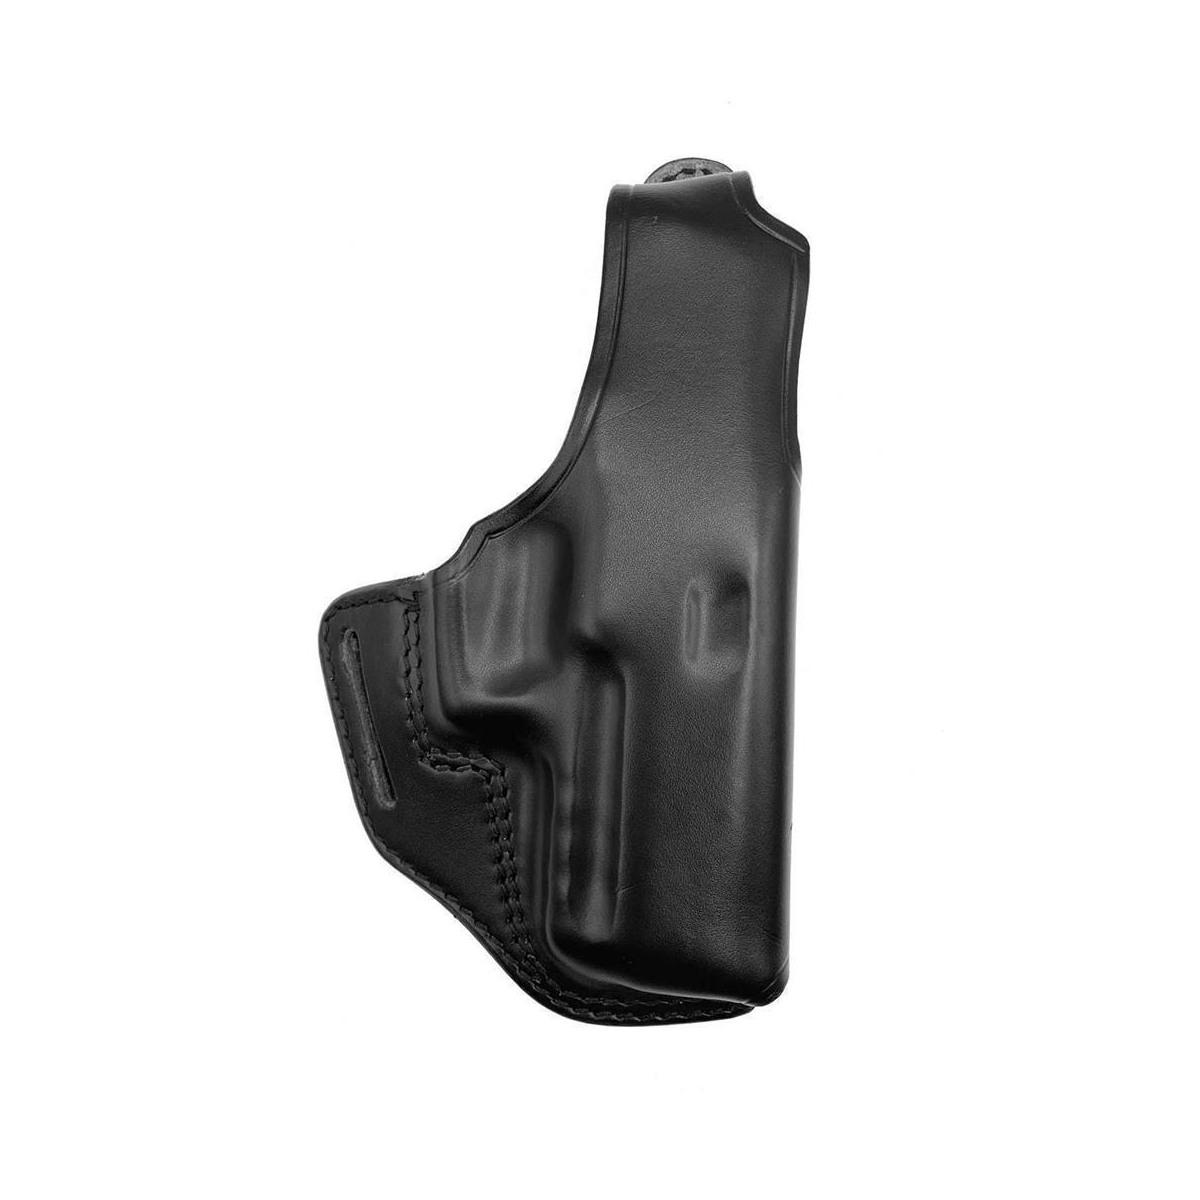 Sickinger Holster BELT MASTER Schwarz Linkshänder Glock 17/22/31/37